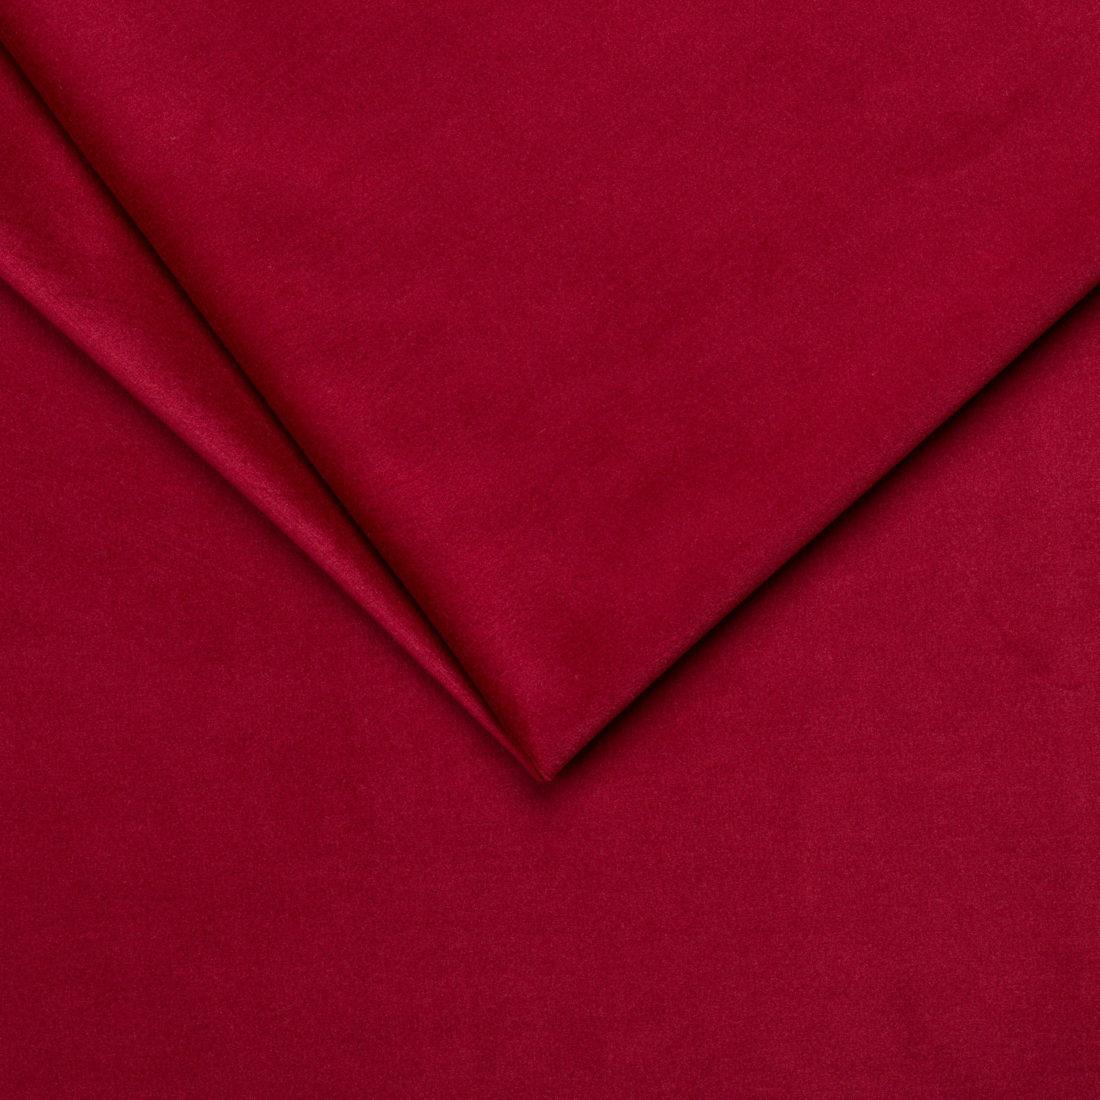 Мебельная ткань Velluto 7 Dark Red, велюр